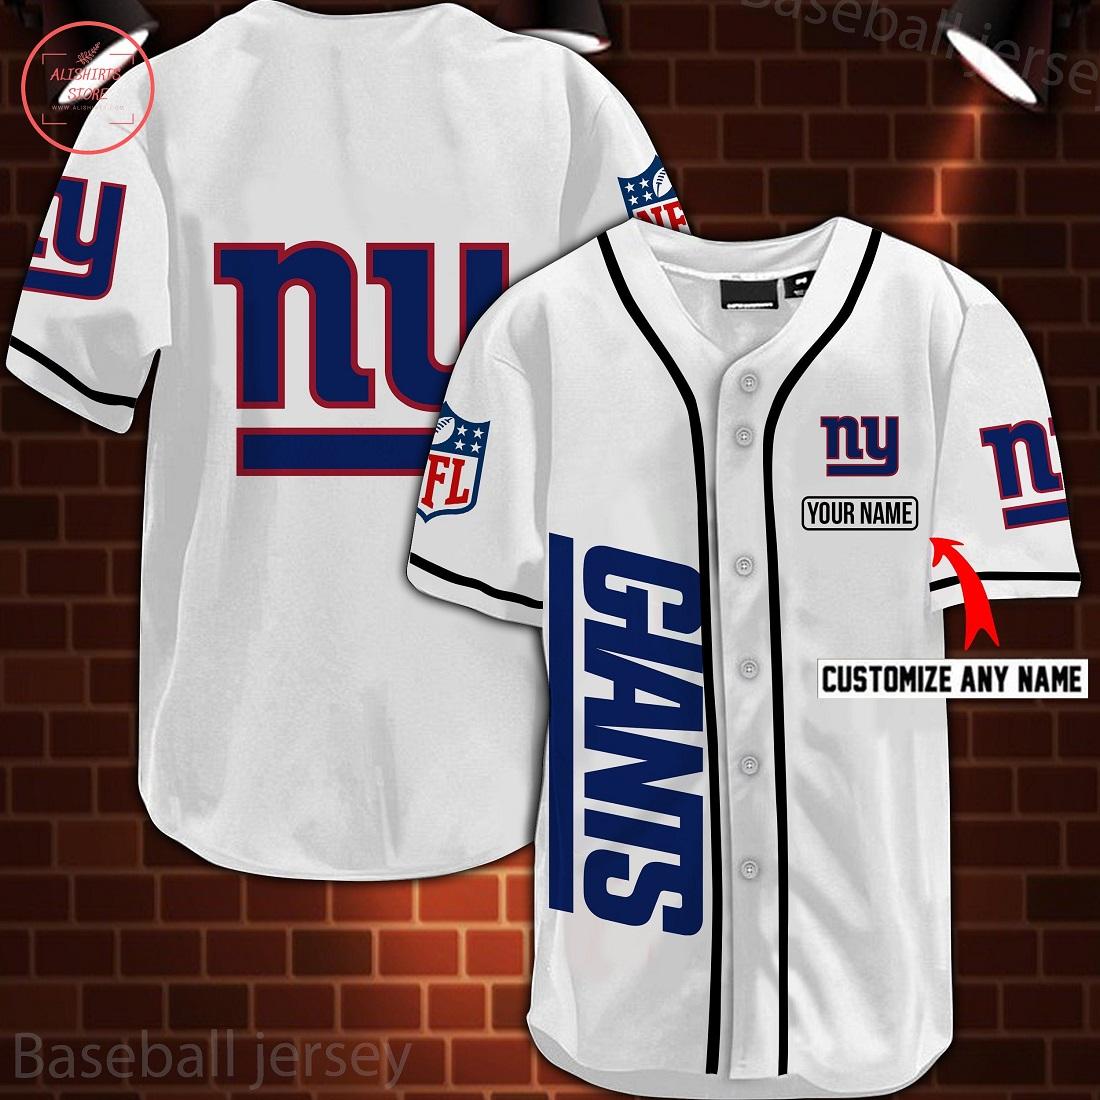 Nfl New York Giants Personalized Baseball Jersey